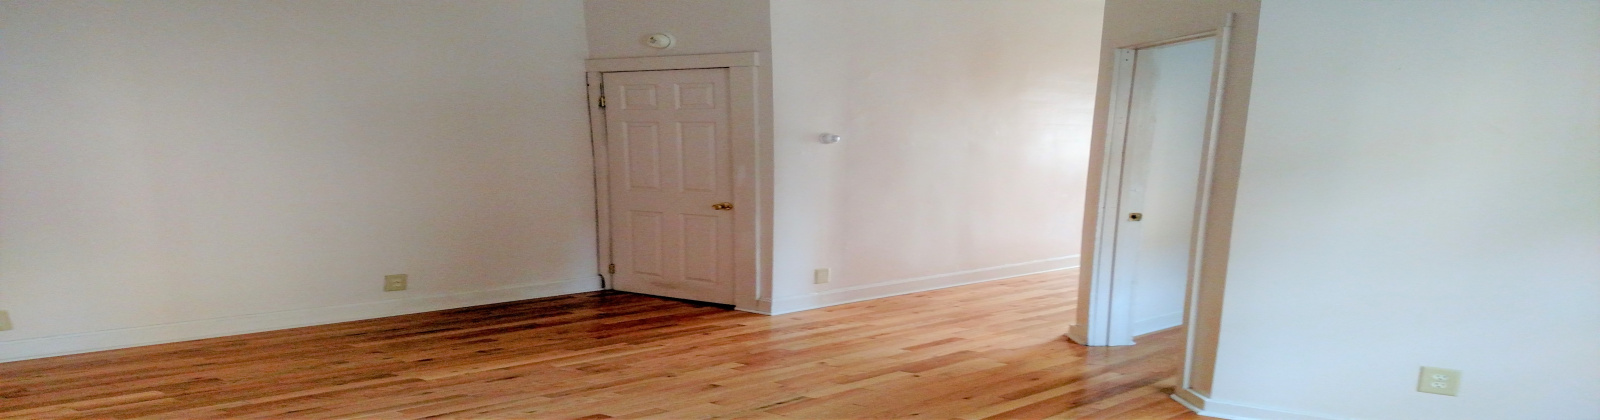 210 W Union St. Apt. A Athens, Ohio, 3 Bedrooms Bedrooms, ,1 BathroomBathrooms,Apartment,For Rent,W Union,1054